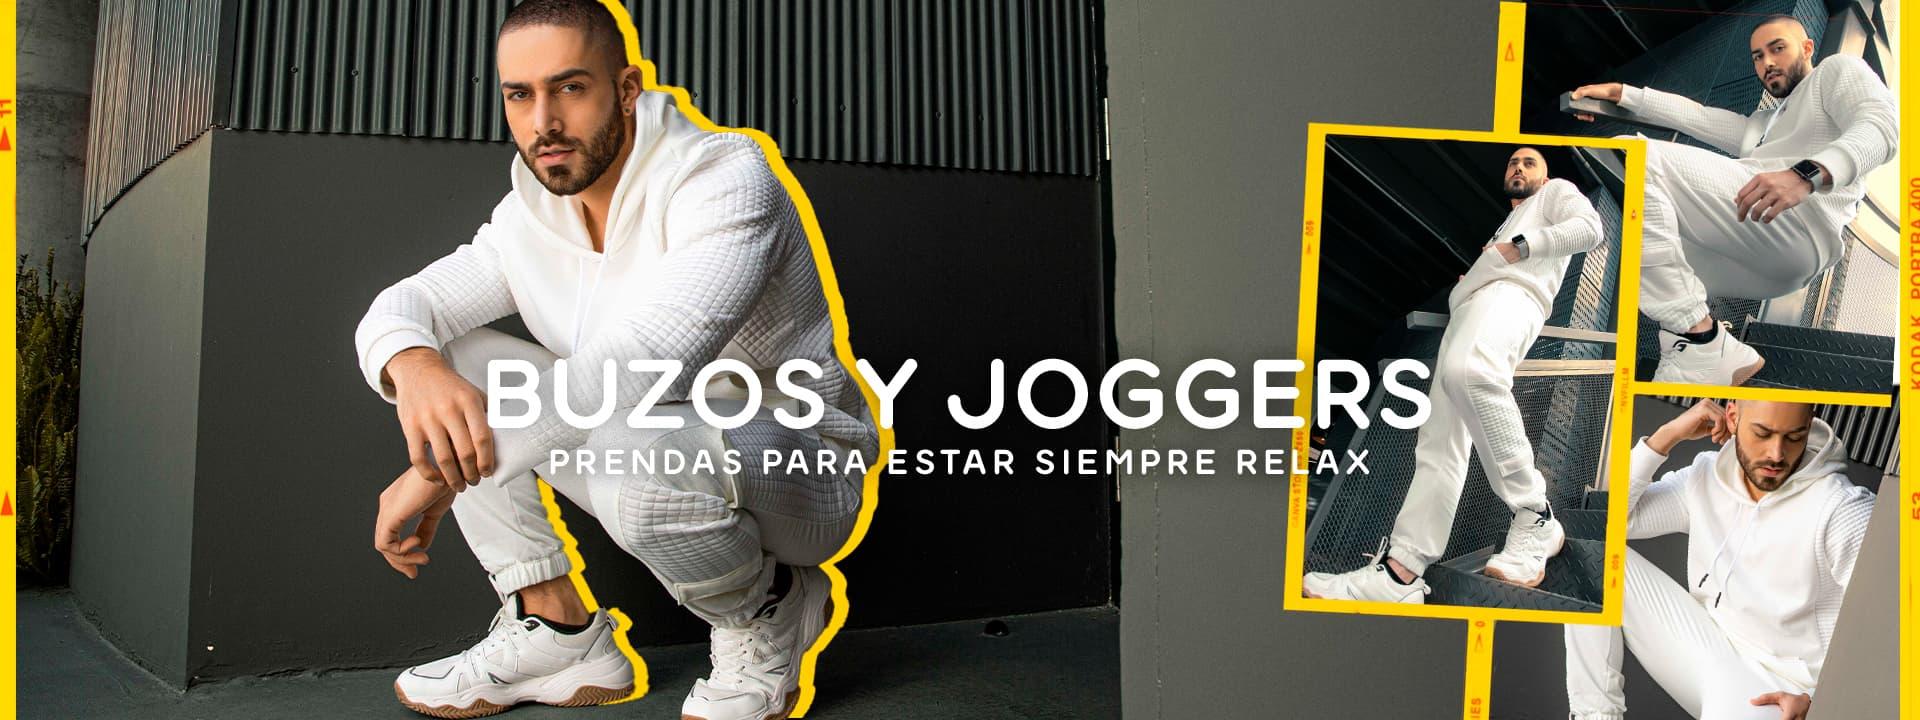 Like Me Hombre Buzos & Joggers